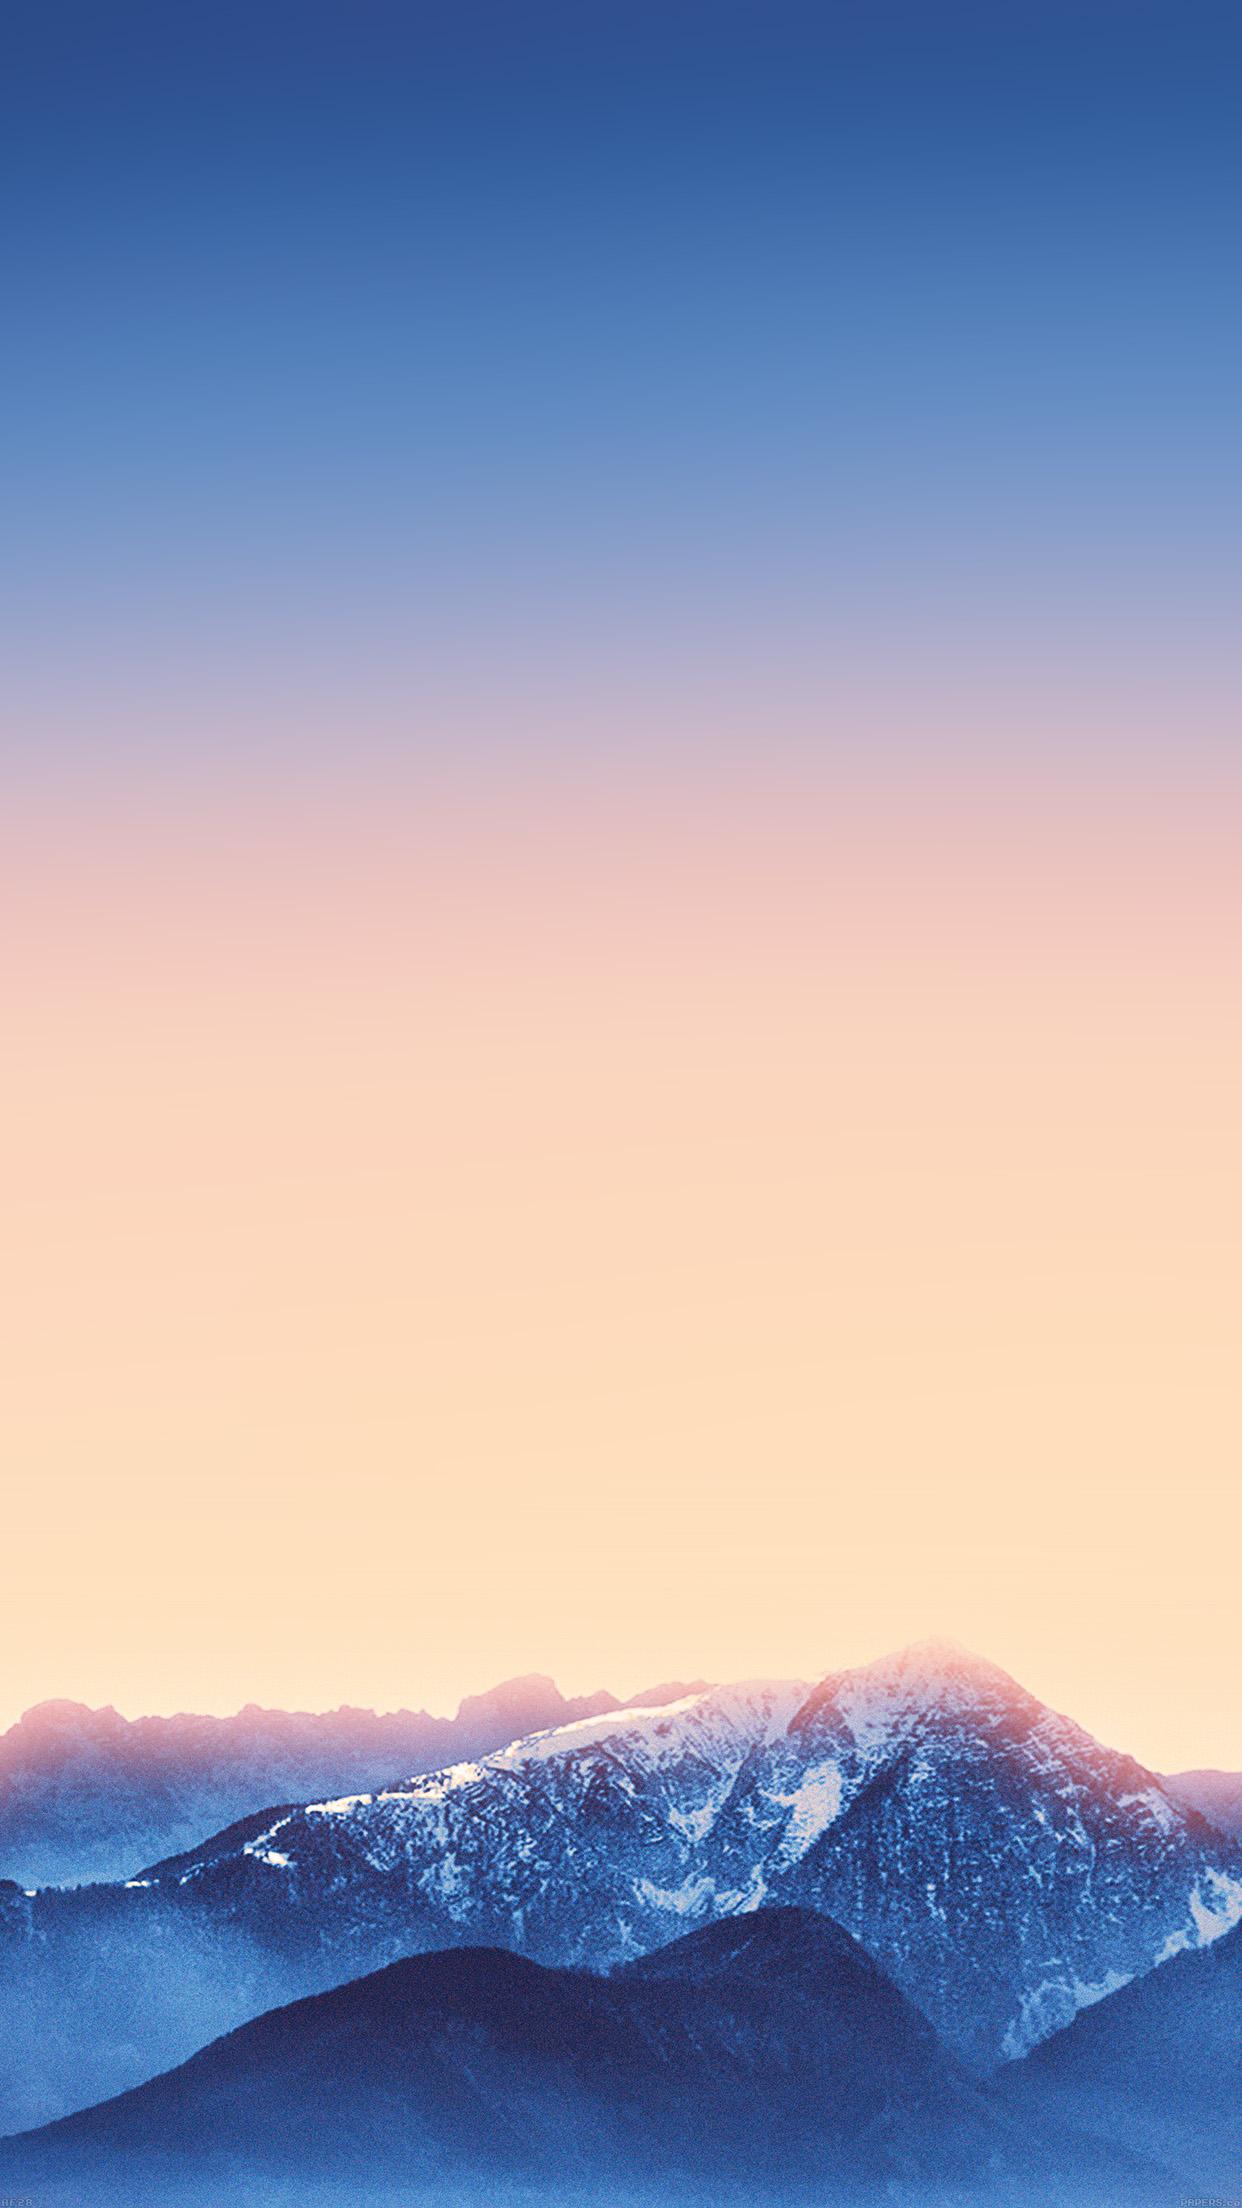 Af28 Ipad Mini 3 Retina Sunshine Wallpaper Official Mountain Apple